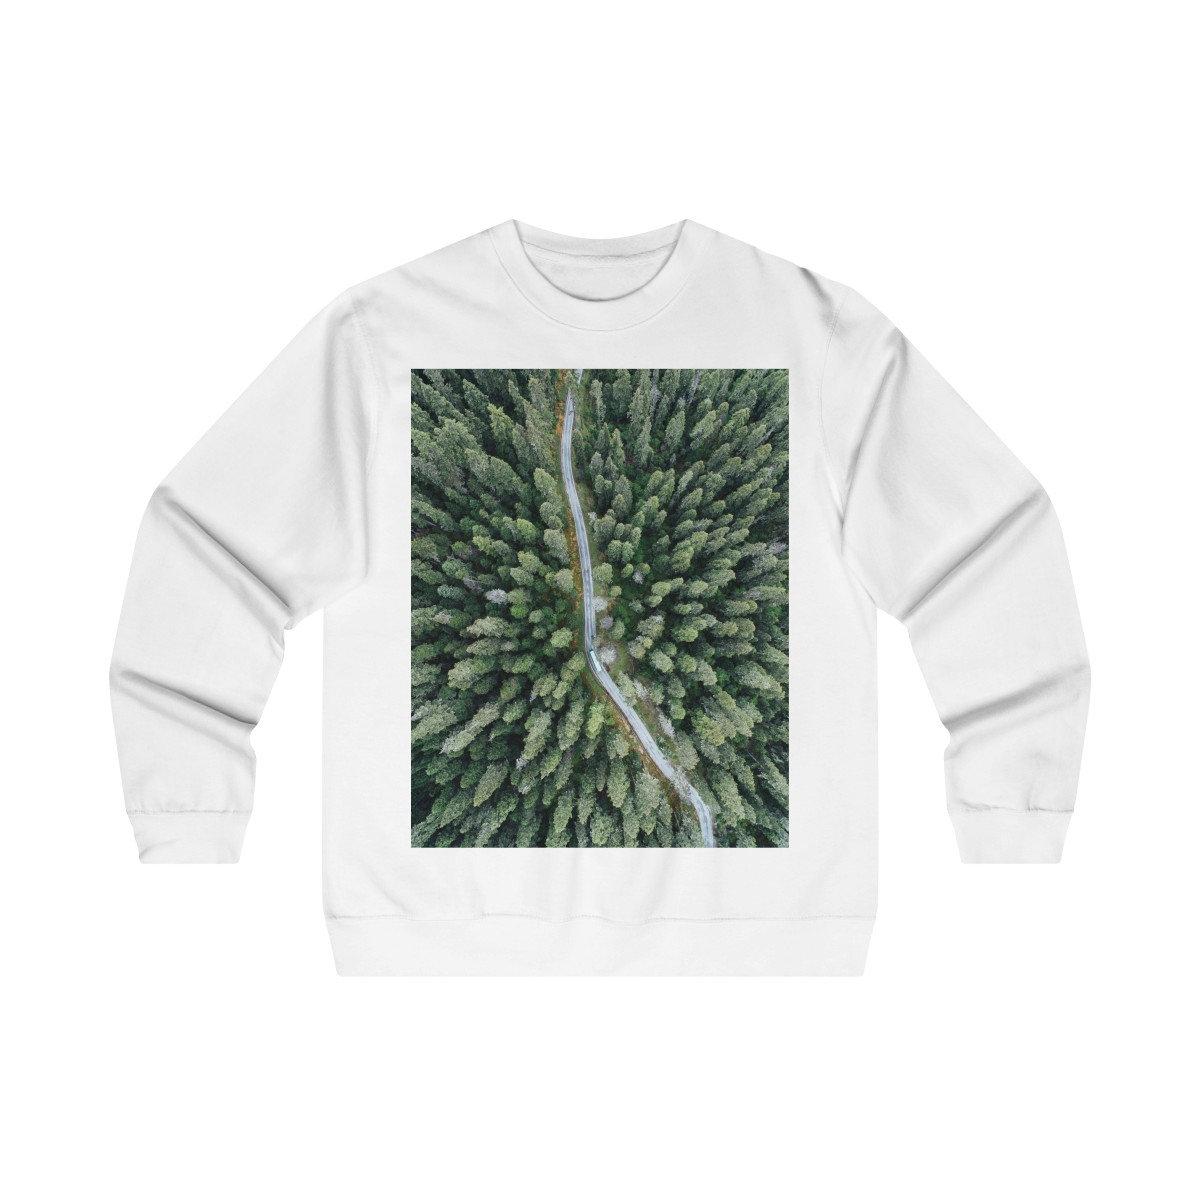 Unisex Sweatshirt Aerial photography print forest road